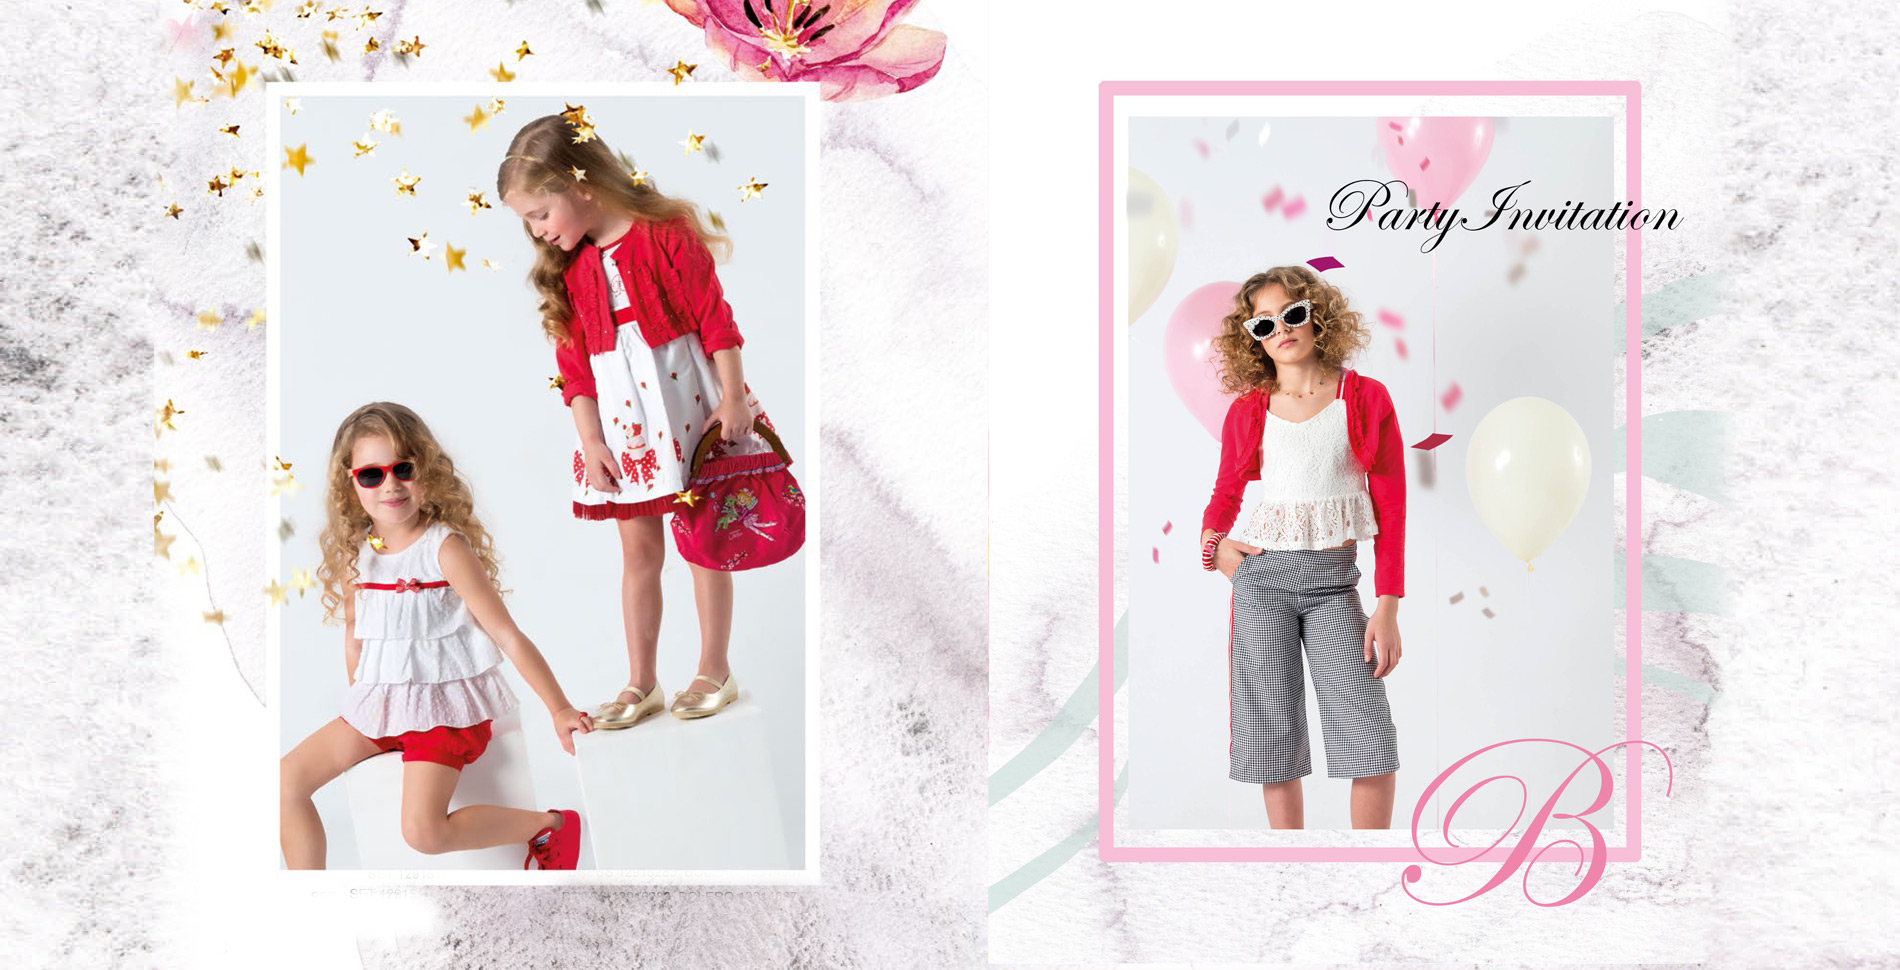 Babylon Fashion Παιδικά ρούχα e32ed5f9f3d